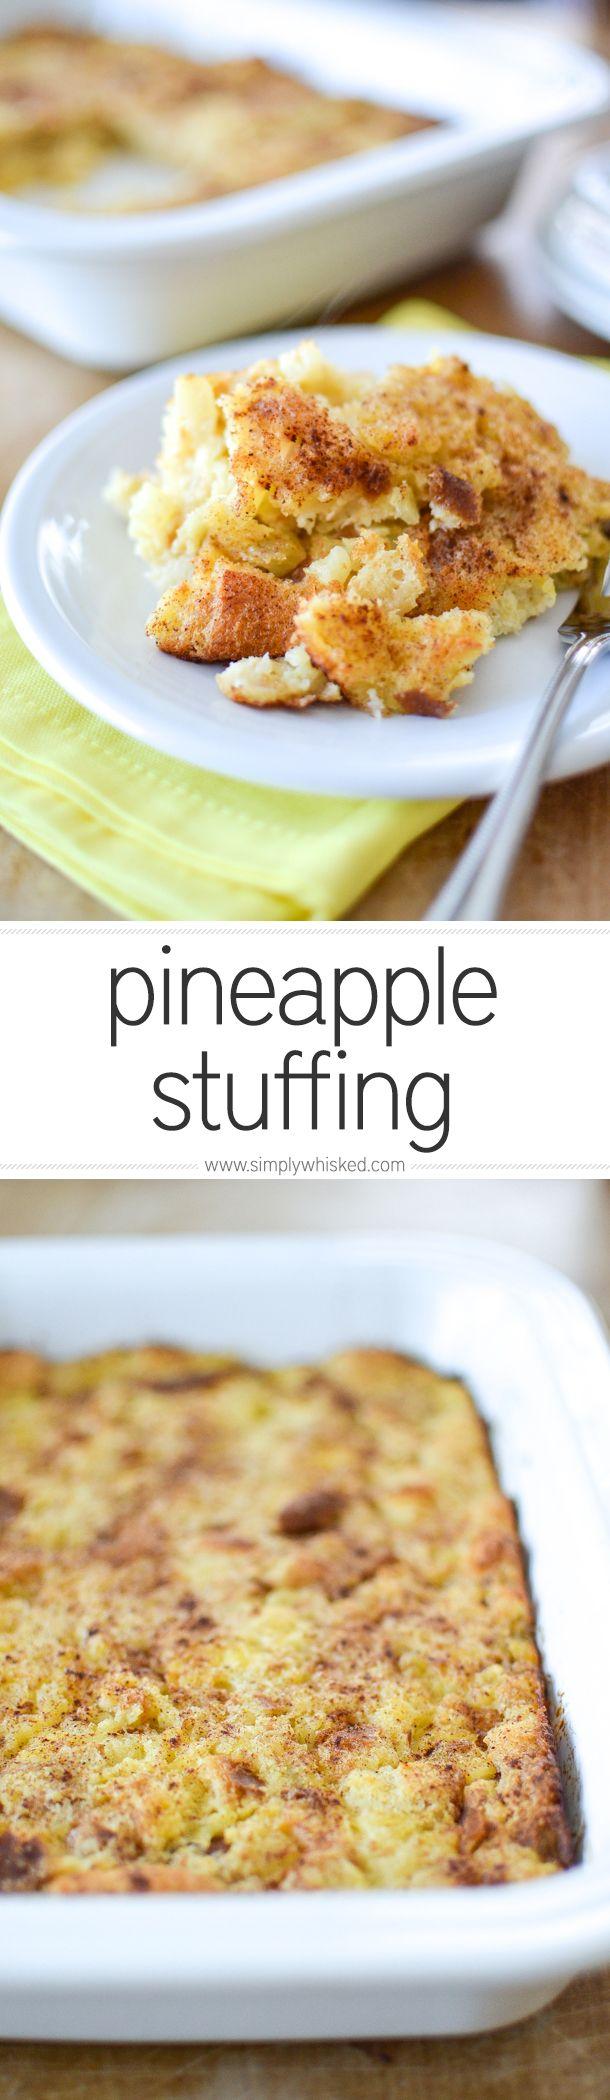 5 Ingredient Pineapple Stuffing   simplywhisked.com